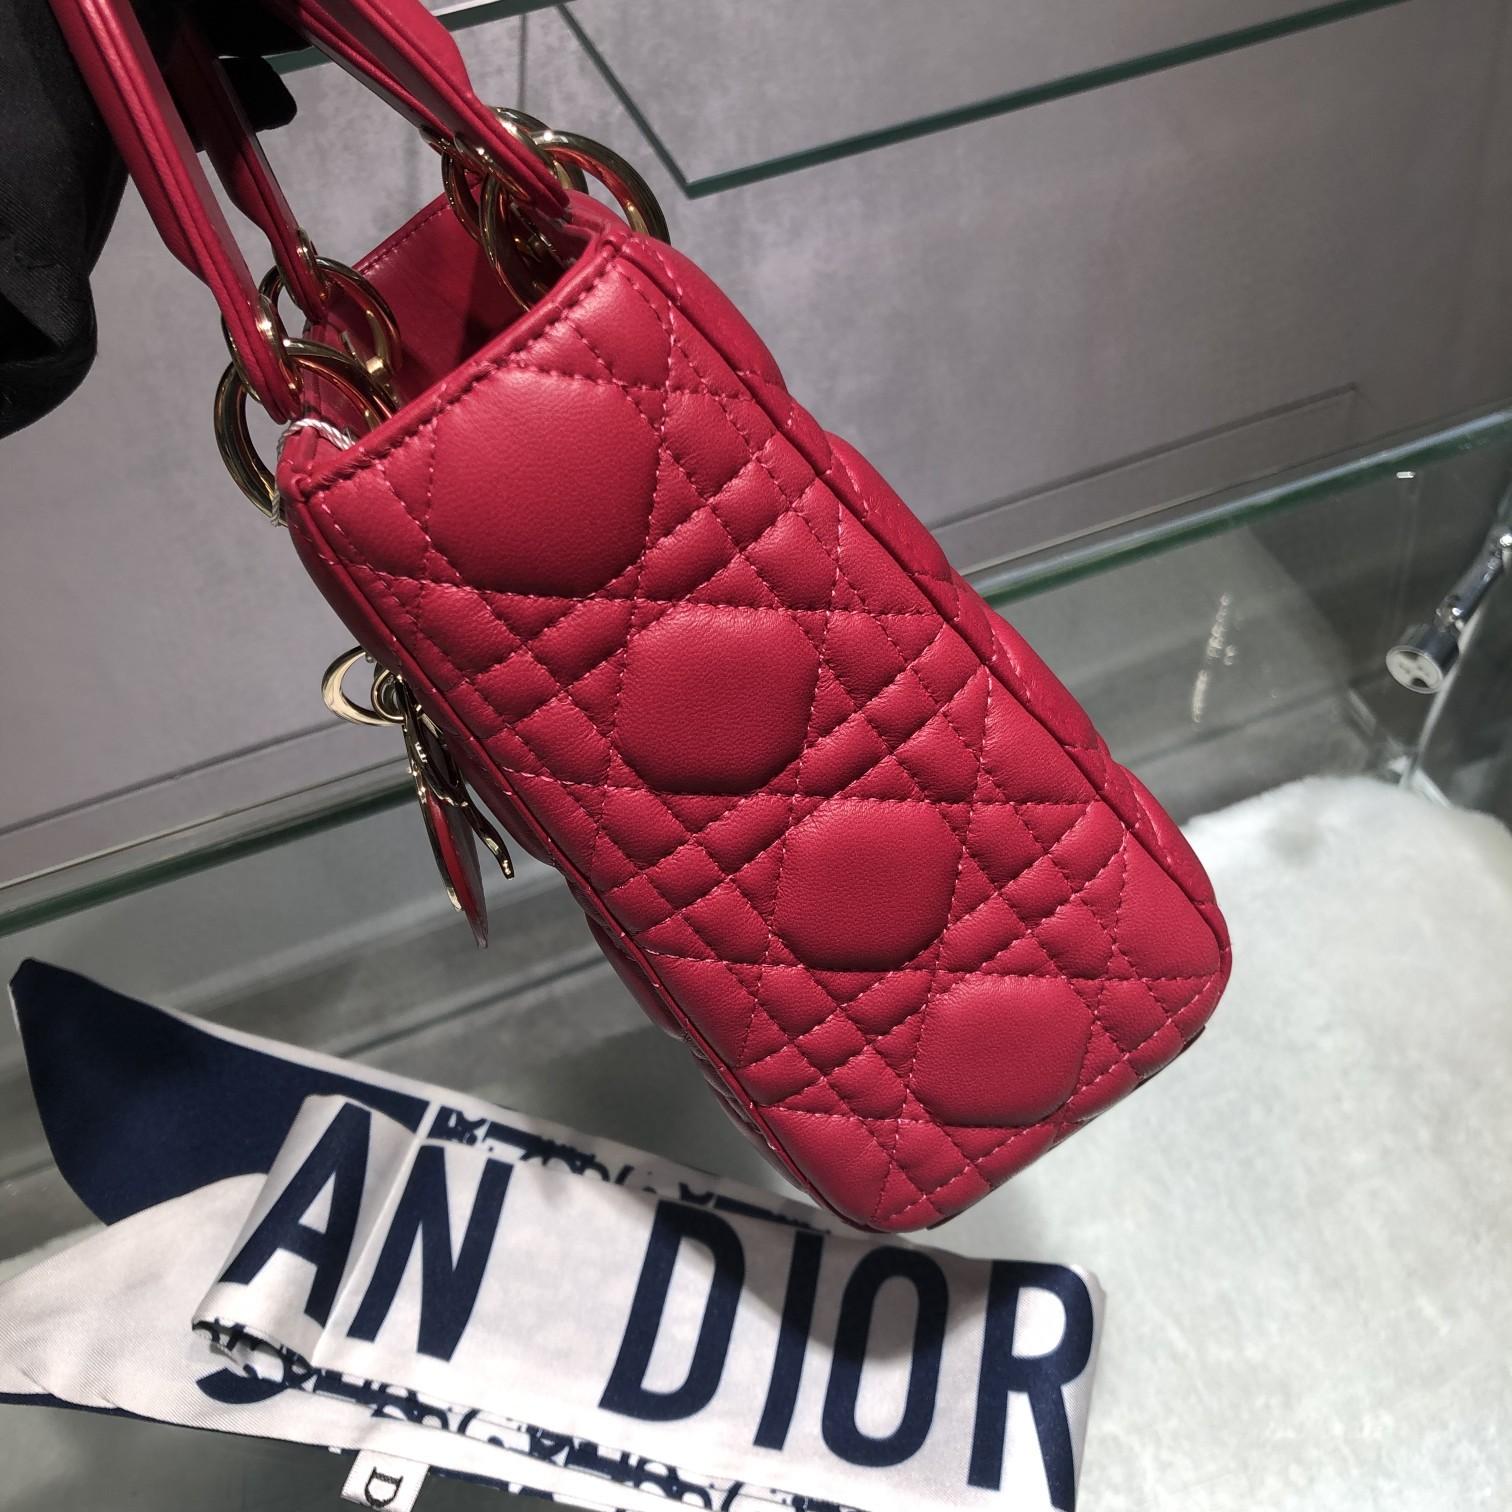 Dior 迪奥 Lady 四格 羊皮 玫红色 金扣 20cm 搭配徽章款宽肩带